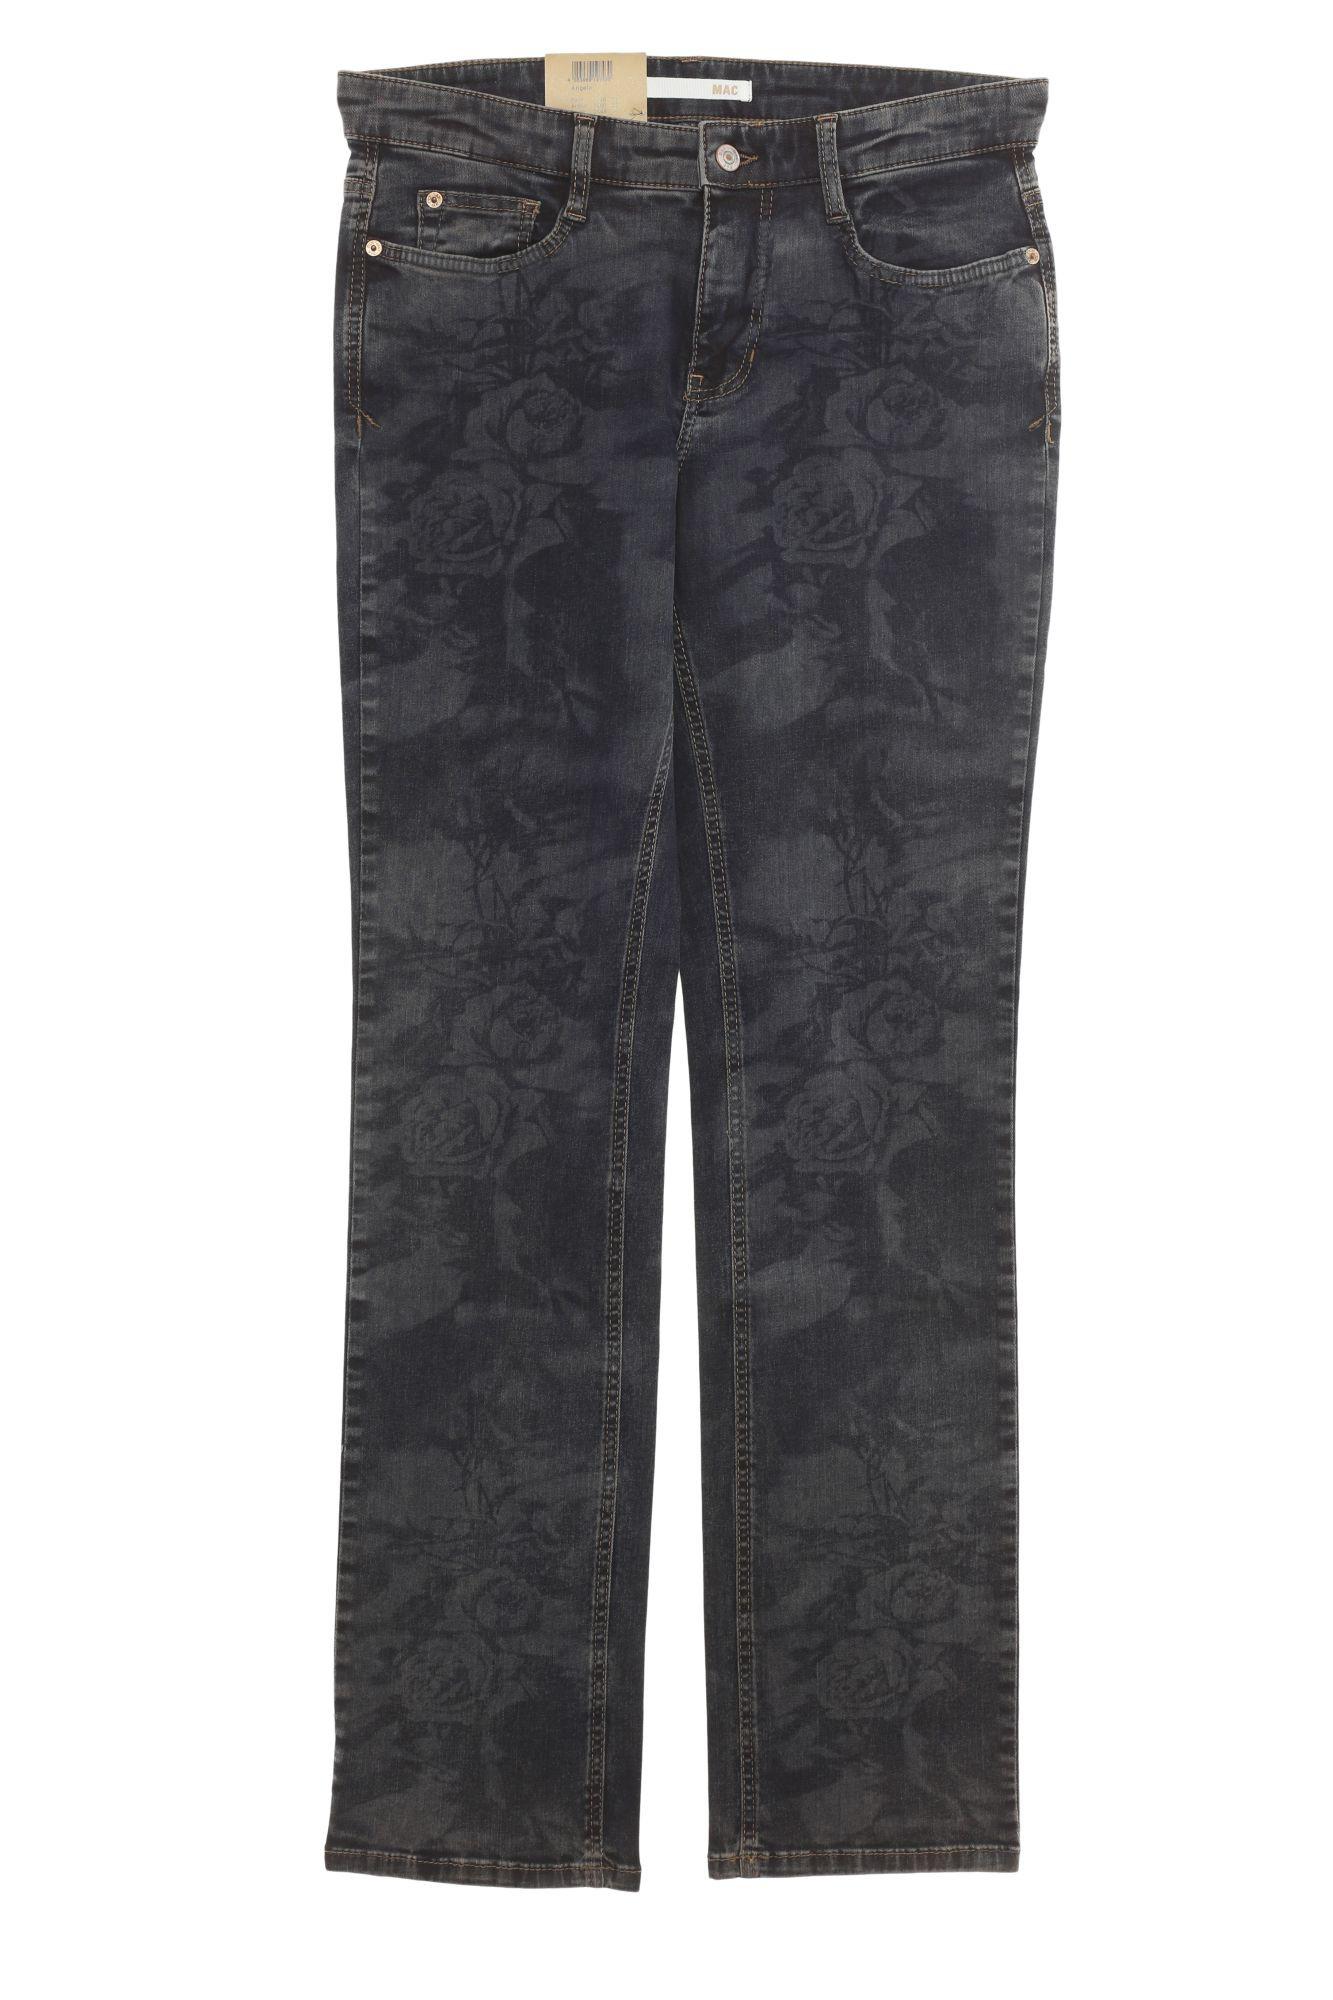 mac jeans angela stretch damen ebay. Black Bedroom Furniture Sets. Home Design Ideas